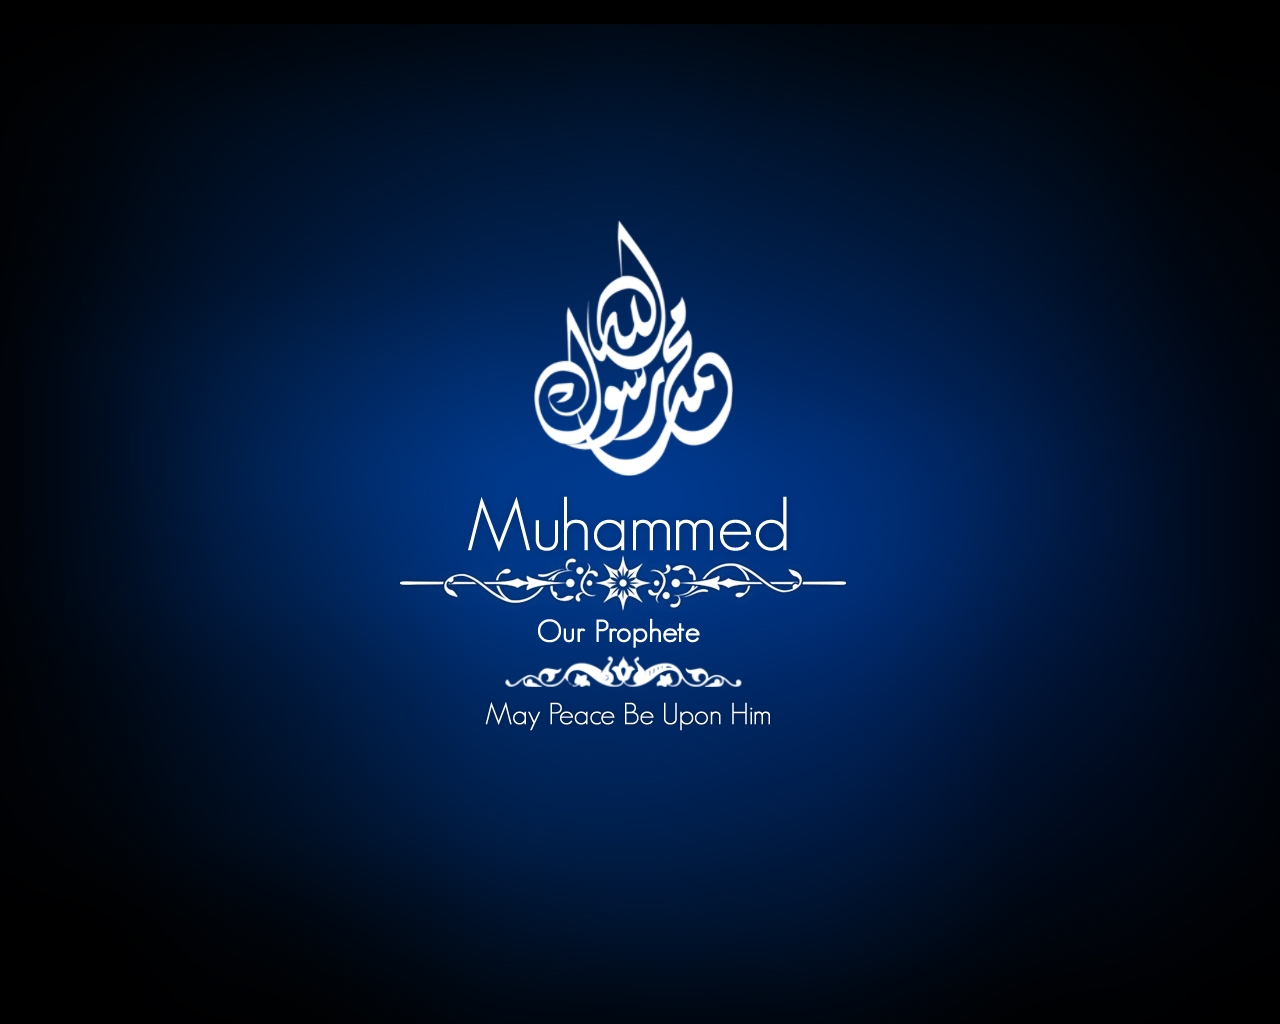 islamic wallpapers 1280x1024